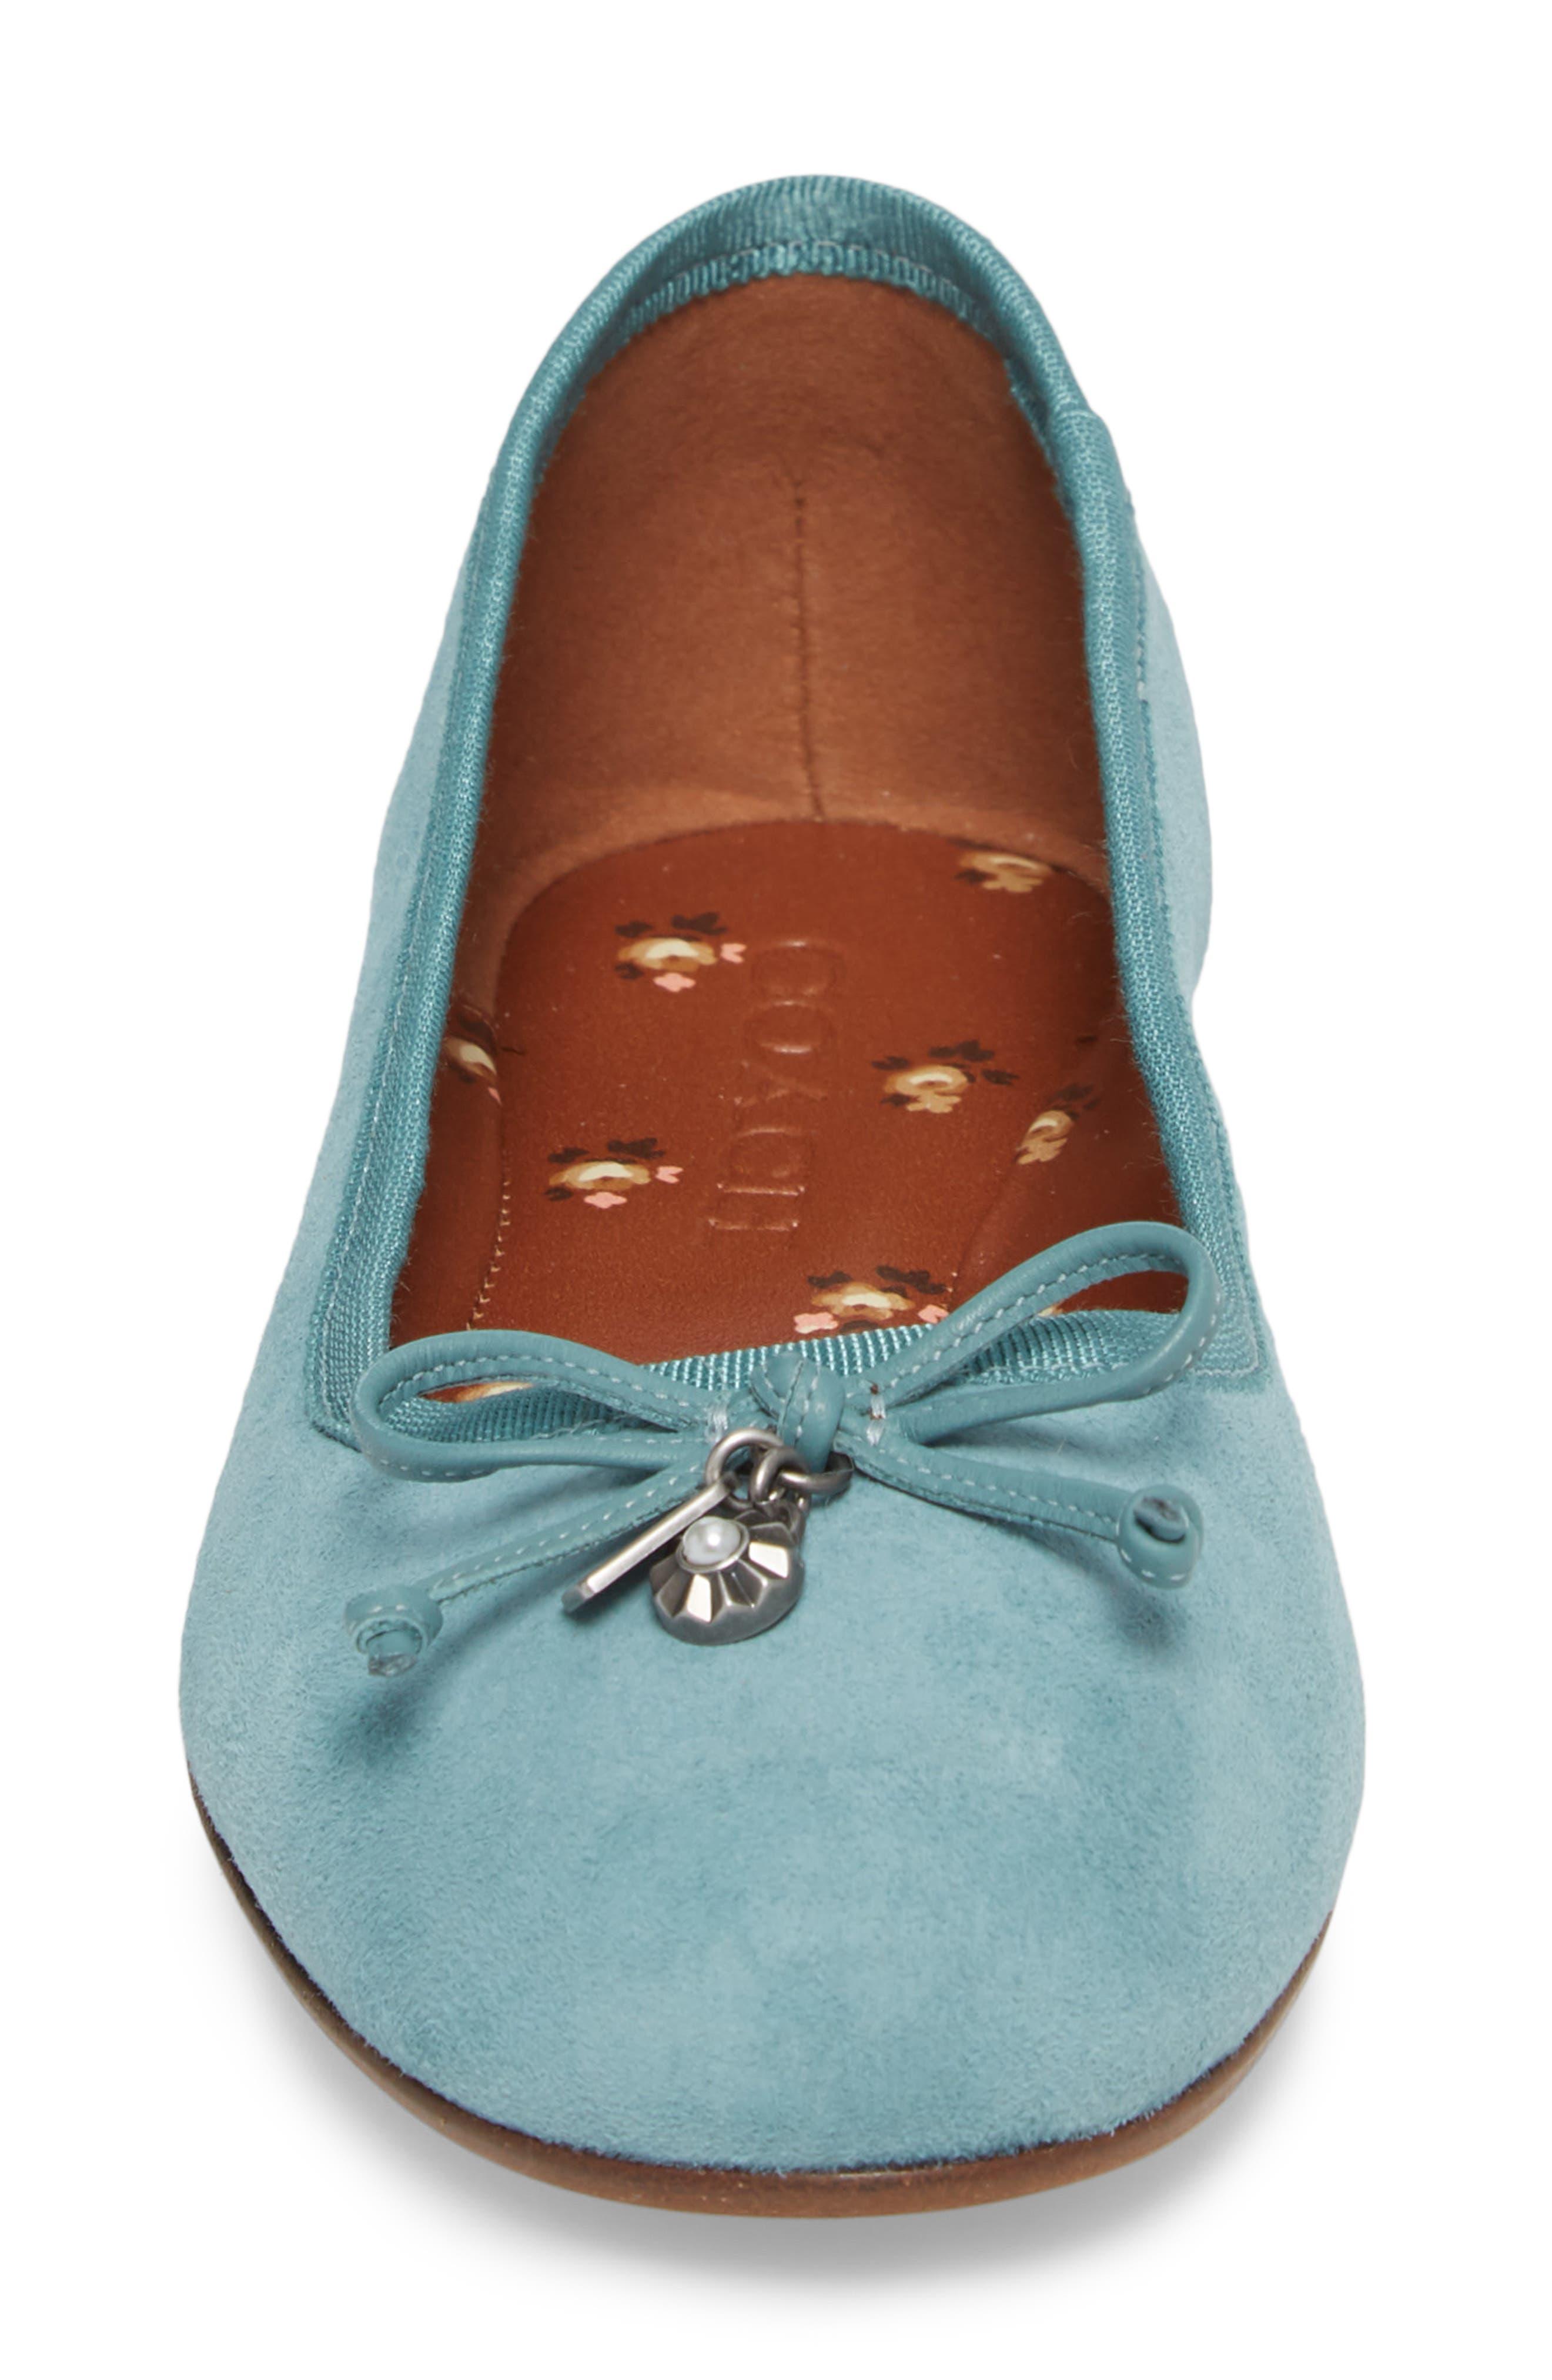 Lola Ballet Flat,                             Alternate thumbnail 4, color,                             Marine Leather